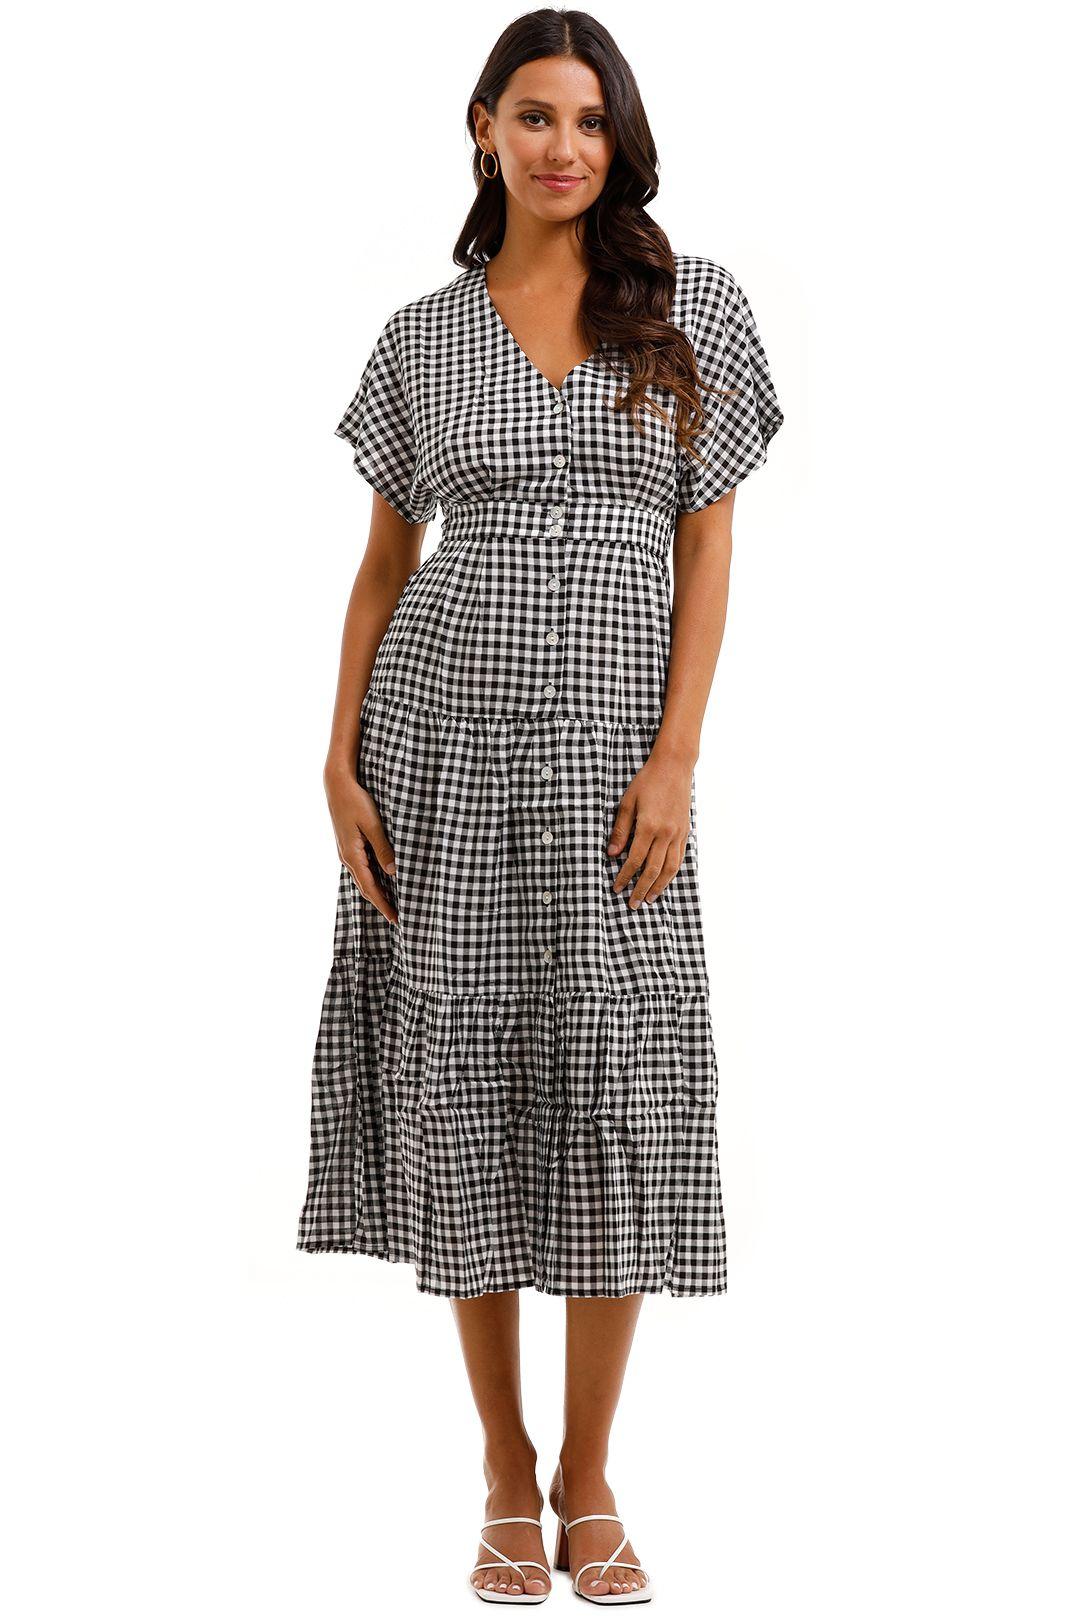 Staple The Label Annika Tiered Midi Dress